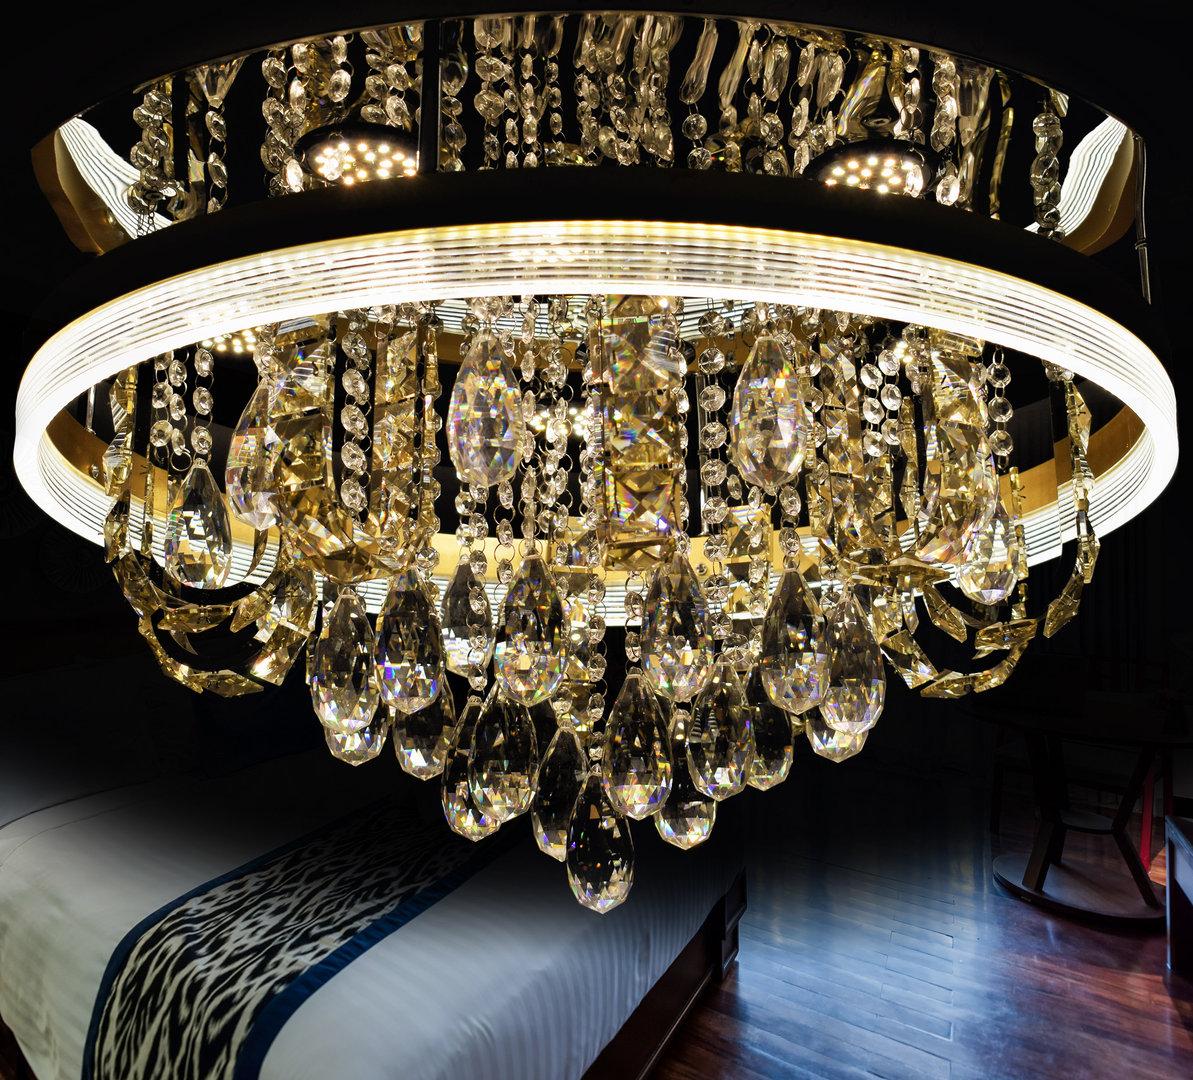 Full Size of Kristall Leuchter Deckenleuchte Led Wohnzimmer Atris 24 Beleuchtung Küche Deko Sofa Kunstleder Big Leder Lampen Deckenlampe Wandbild Board Liege Moderne Wohnzimmer Led Wohnzimmer Deckenleuchte